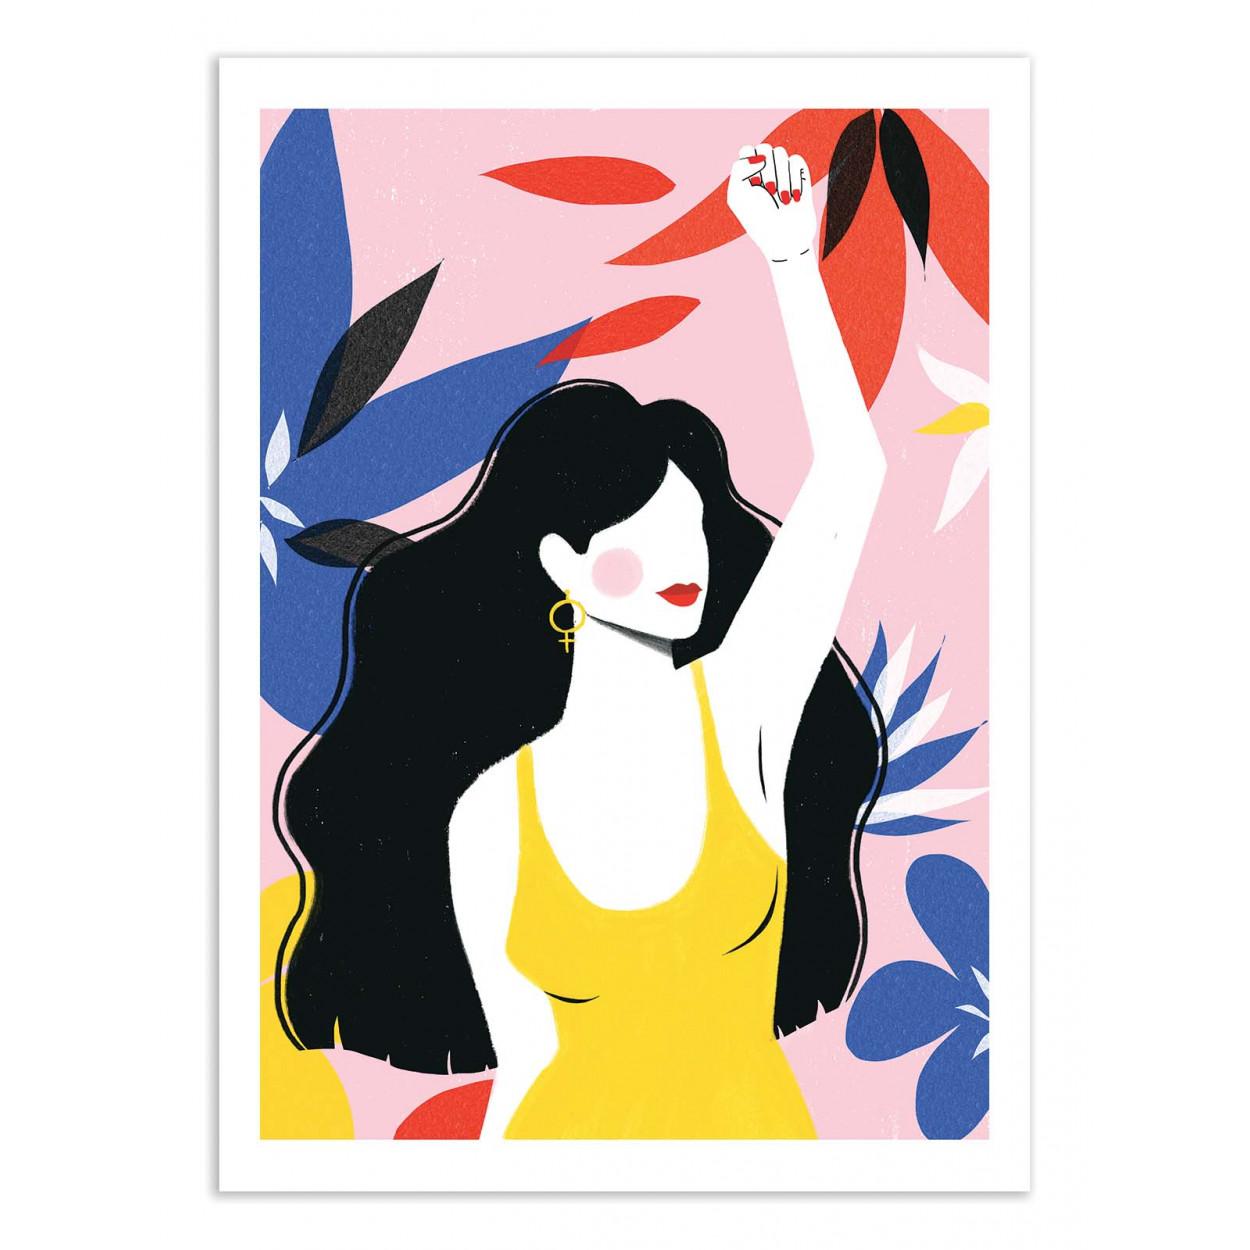 SPEAKOUT - MAJA TOMLJANIC - Affiche d'art 50 x 70 cm